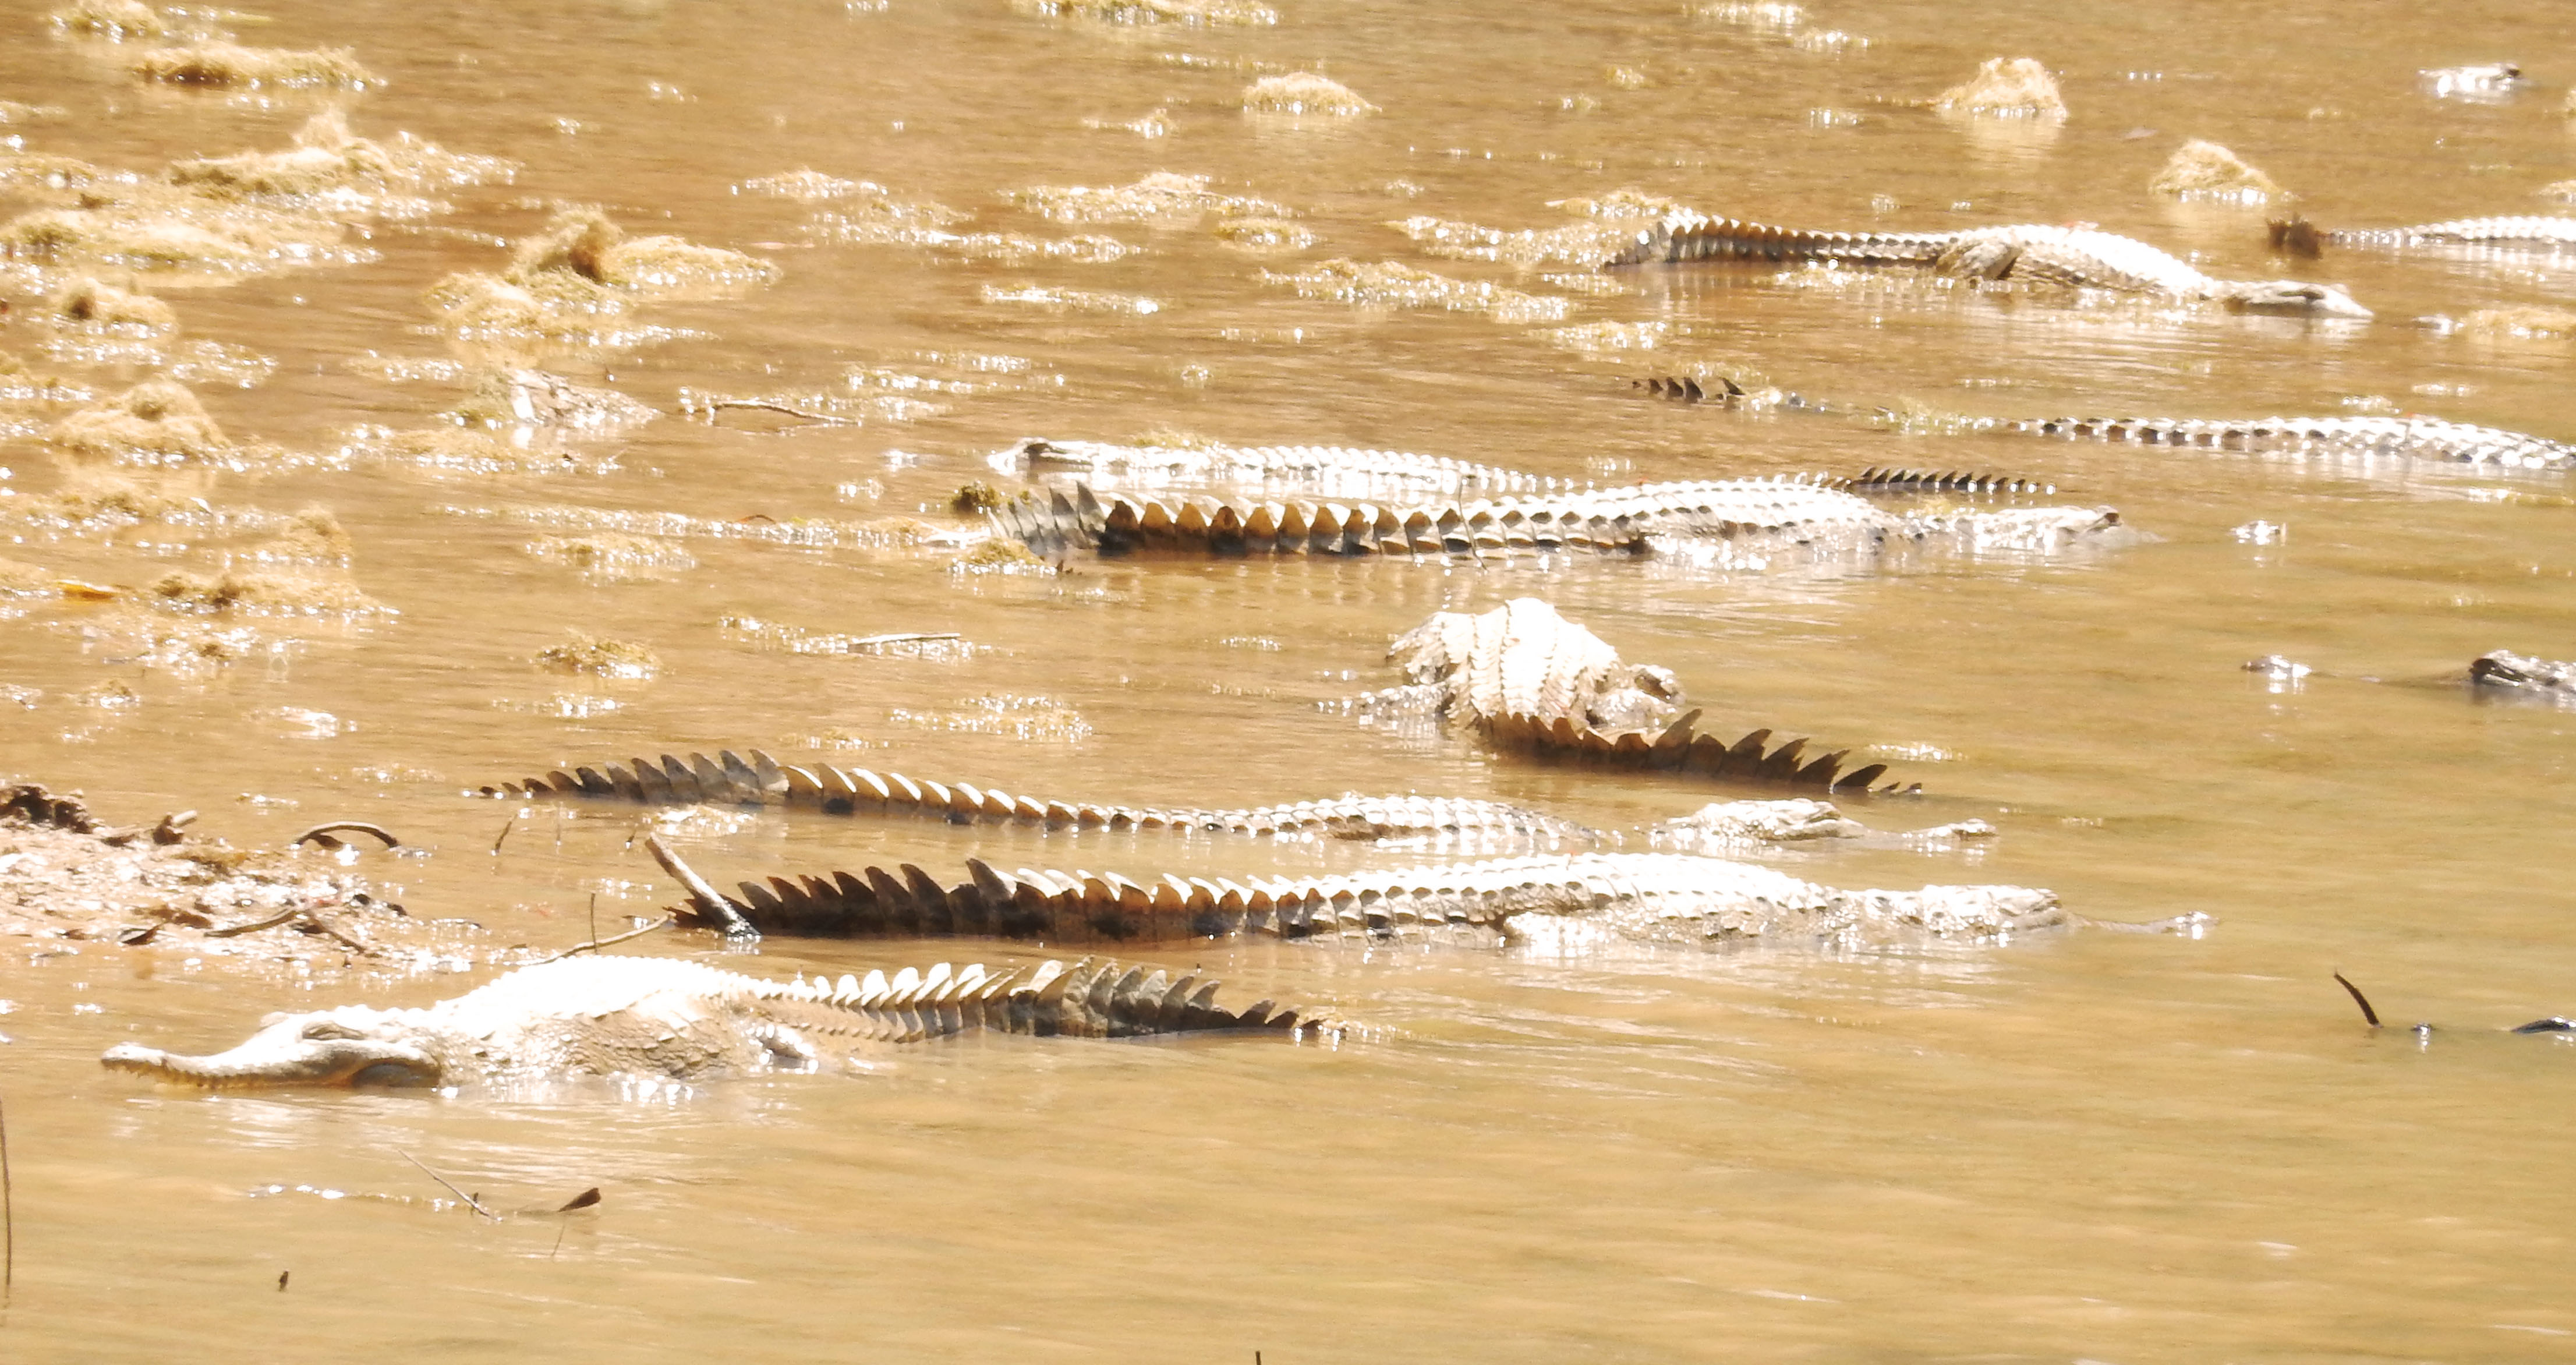 mia-und-ich-blog-reise-travel-westernaustralia-westaustralien-freshwater-crocodile-krokodil-windjana-gorge-australien-australia